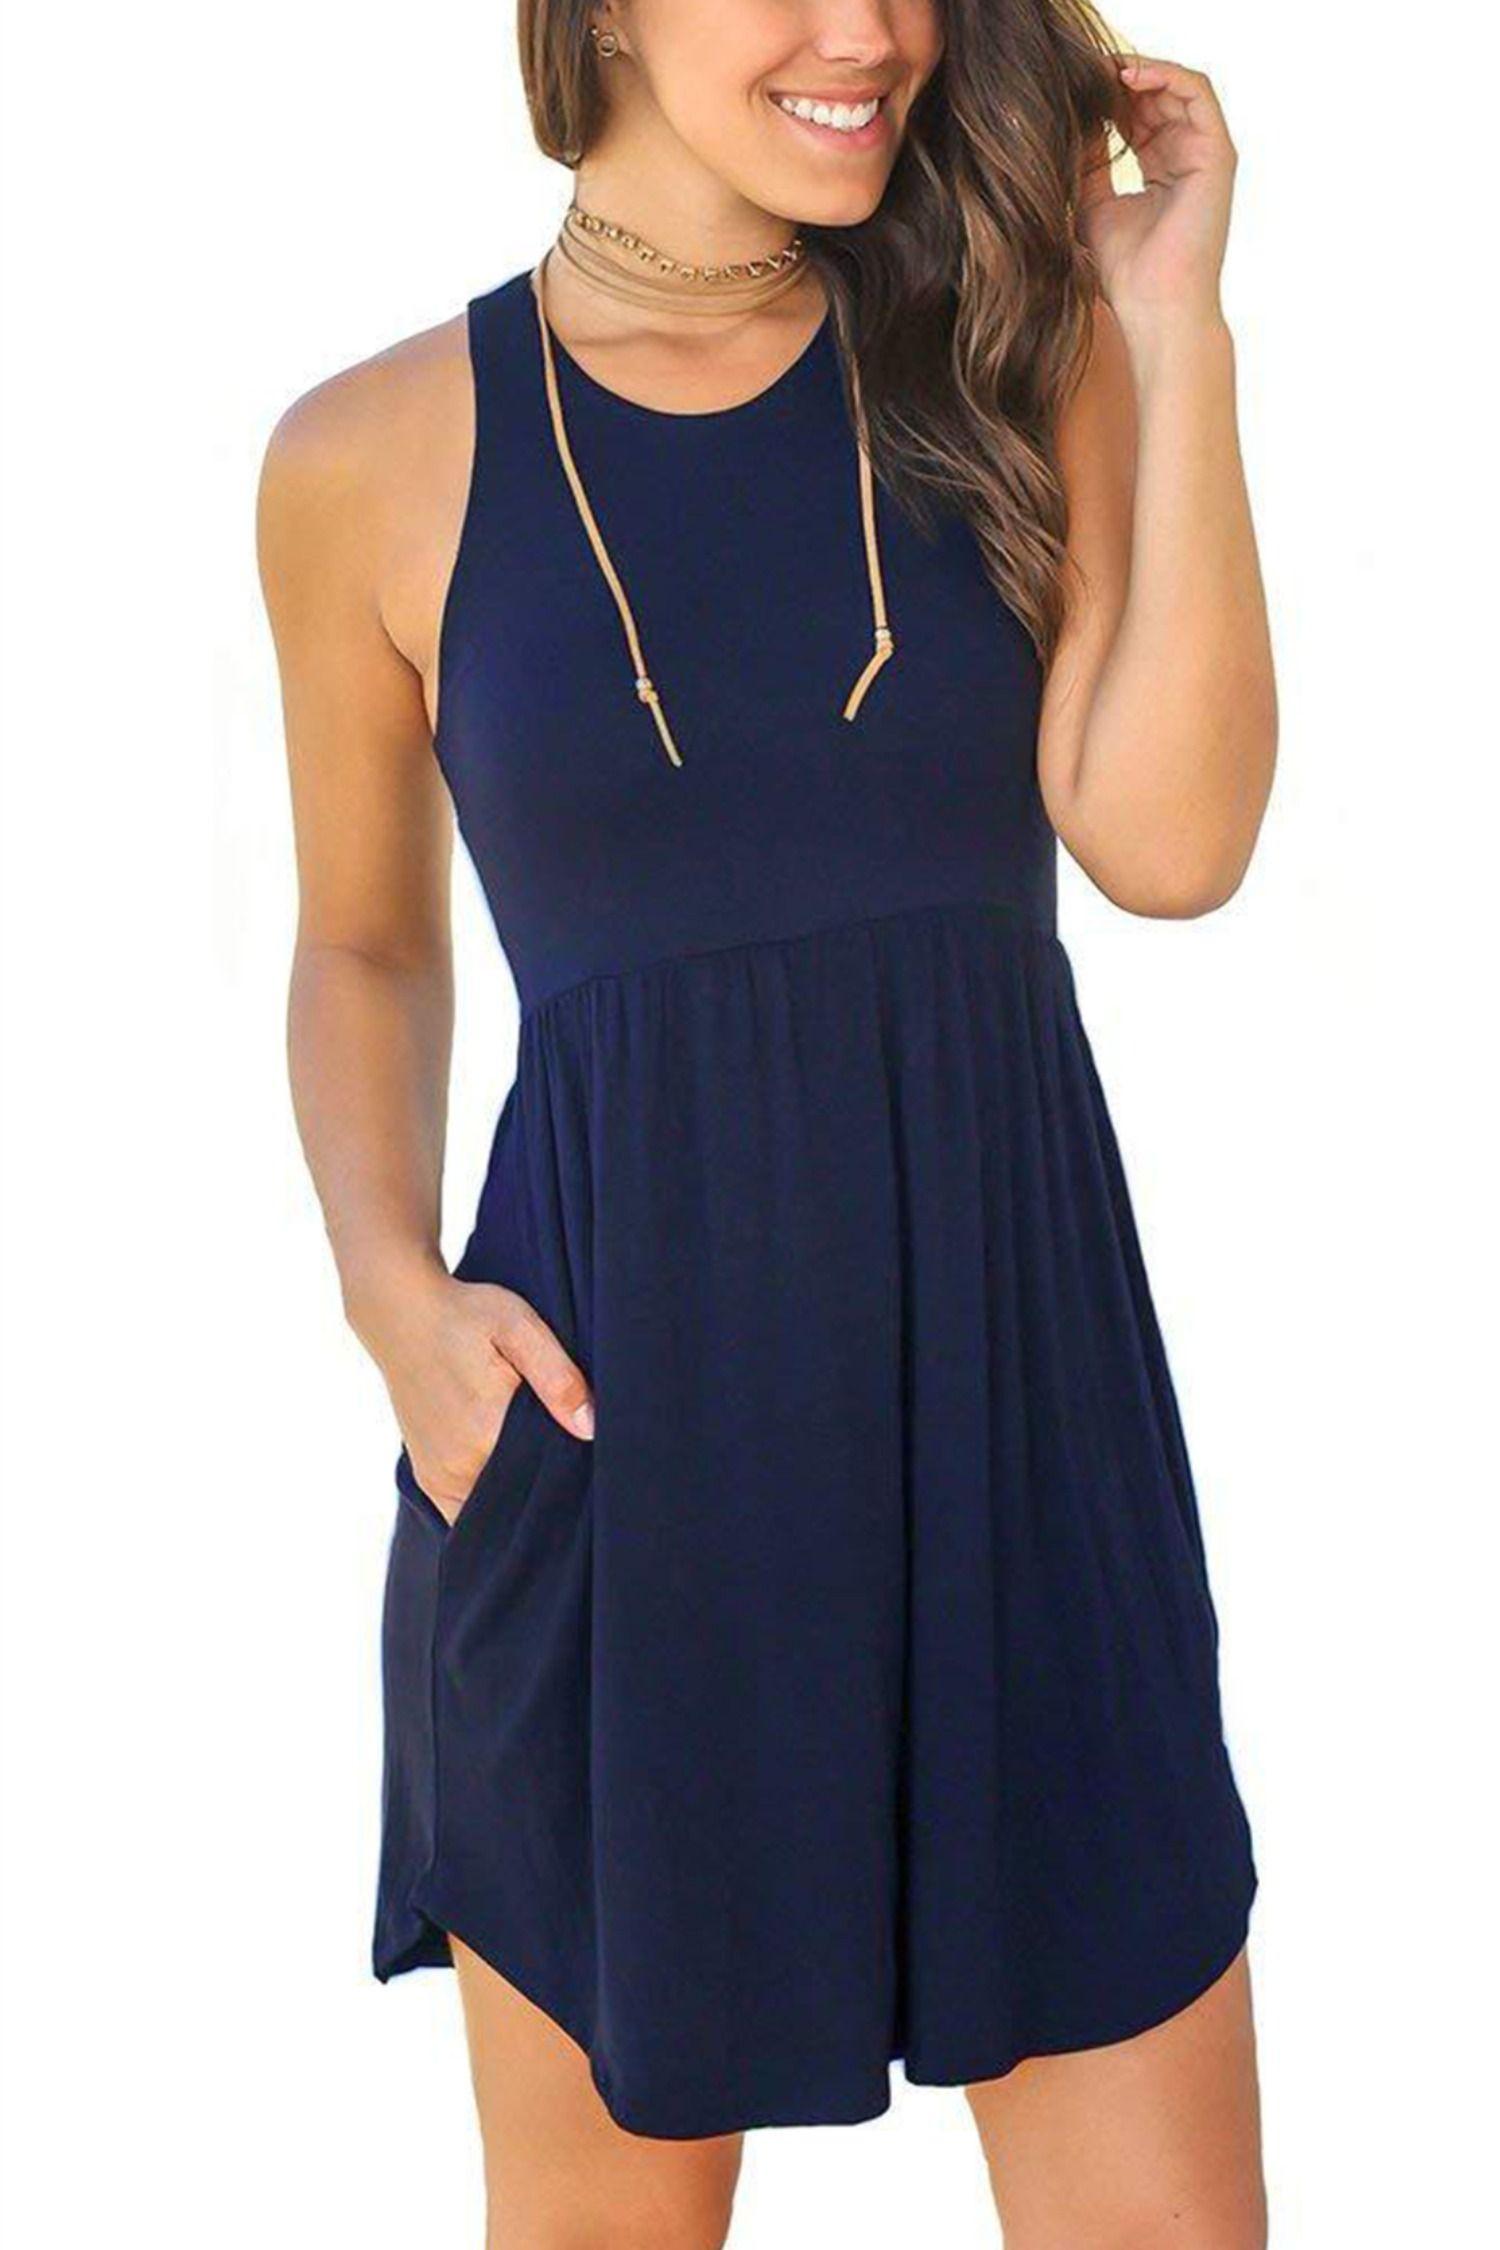 Pin On Dress Picks [ 2250 x 1500 Pixel ]